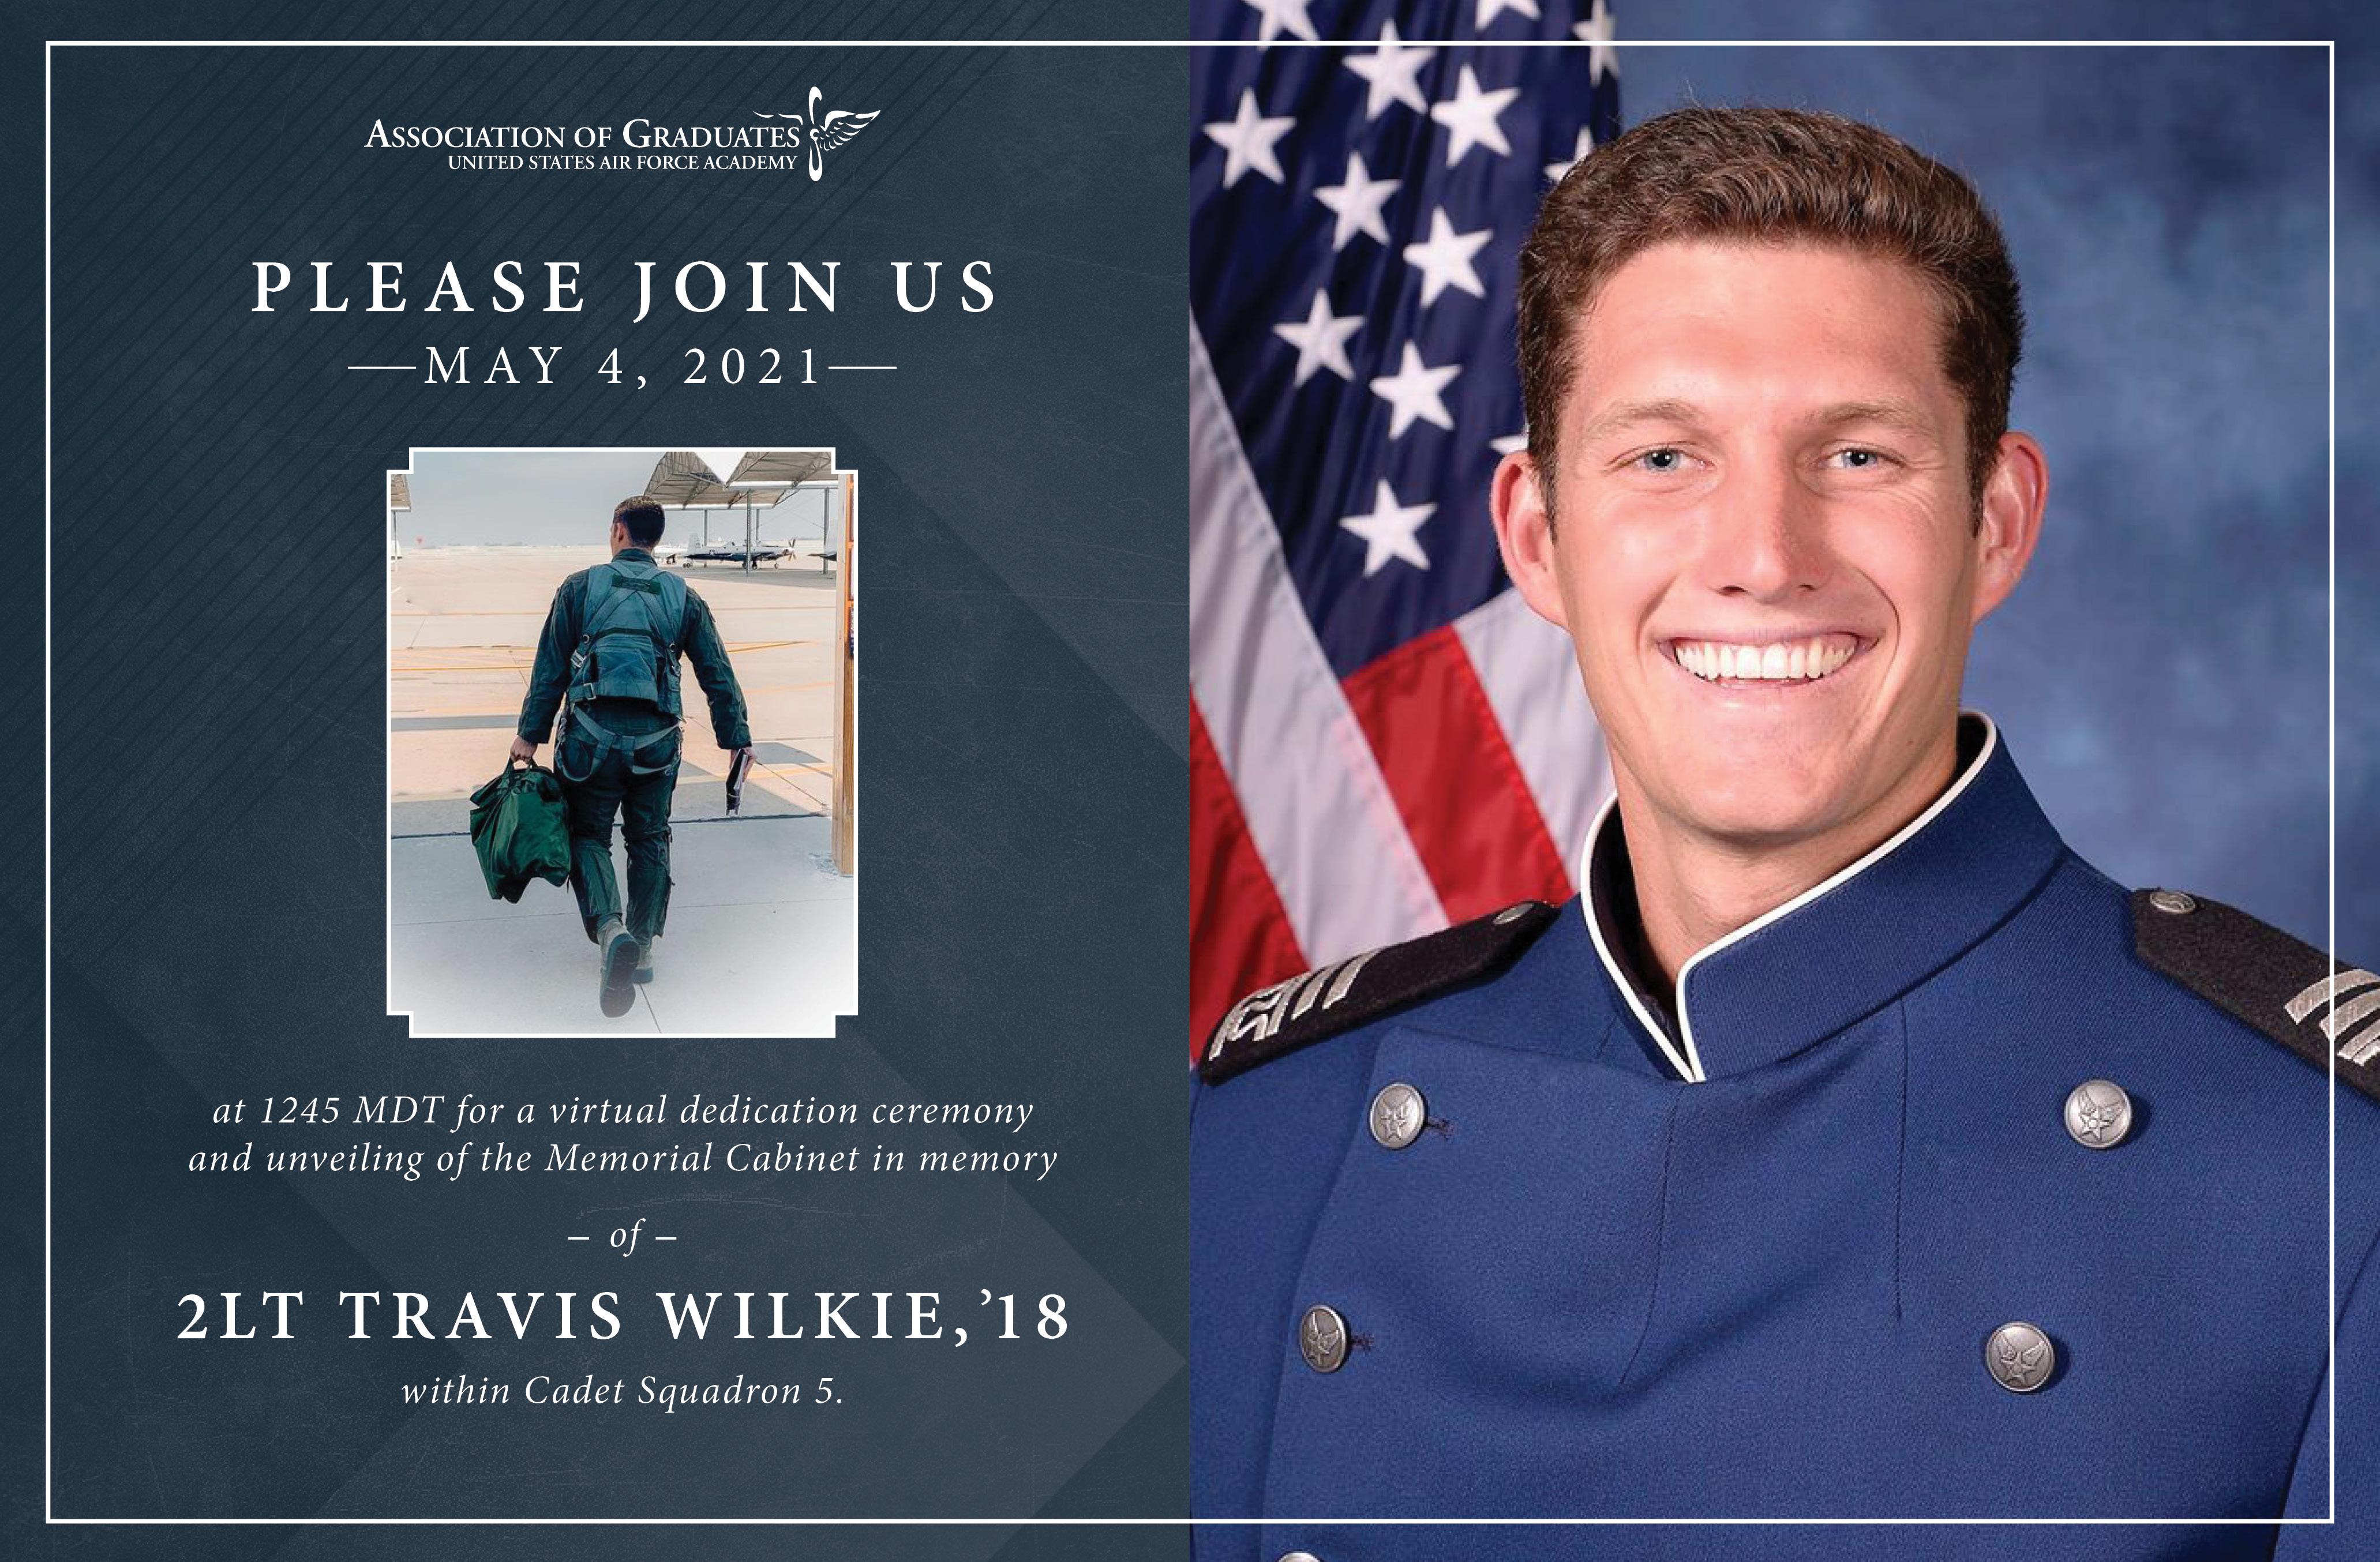 Image for Memorial Cabinet Dedication Ceremony in Memory of 2Lt Travis Wilkie webinar